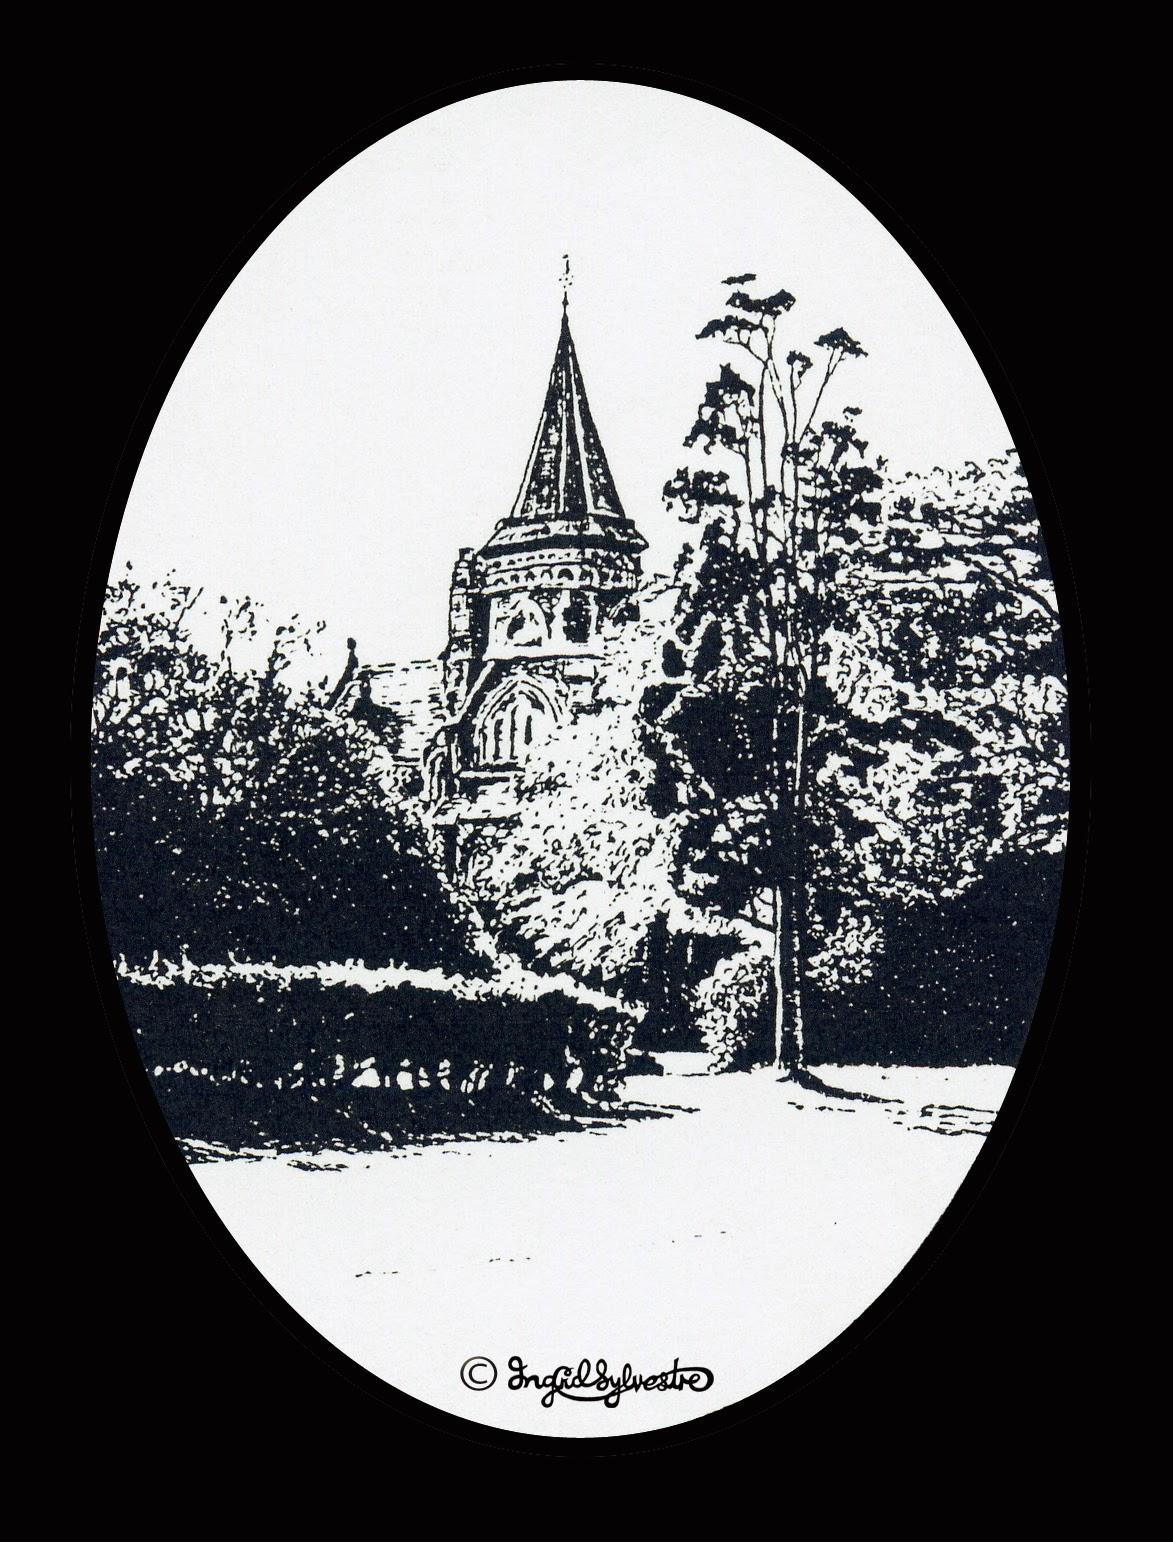 Grey Towers Nunthorpe Cleveland by artist Ingrid Sylvestre